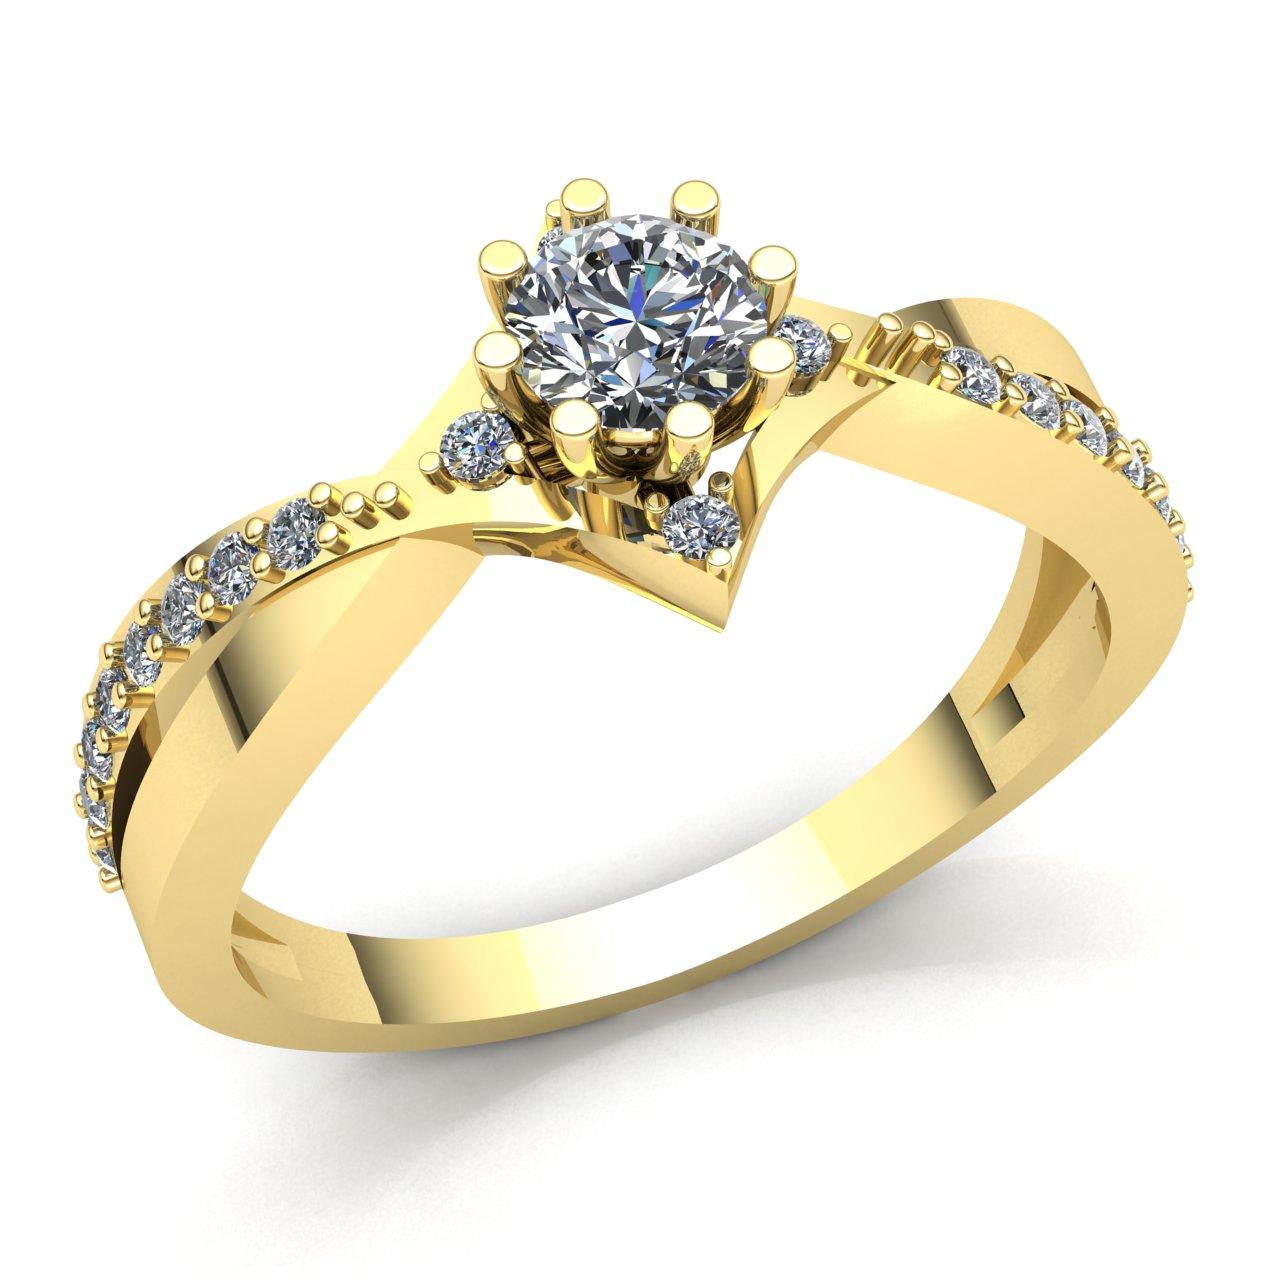 0.33ct Round Cut Diamond Ladies Solitaire Anniversary Engagement Ring 14K gold